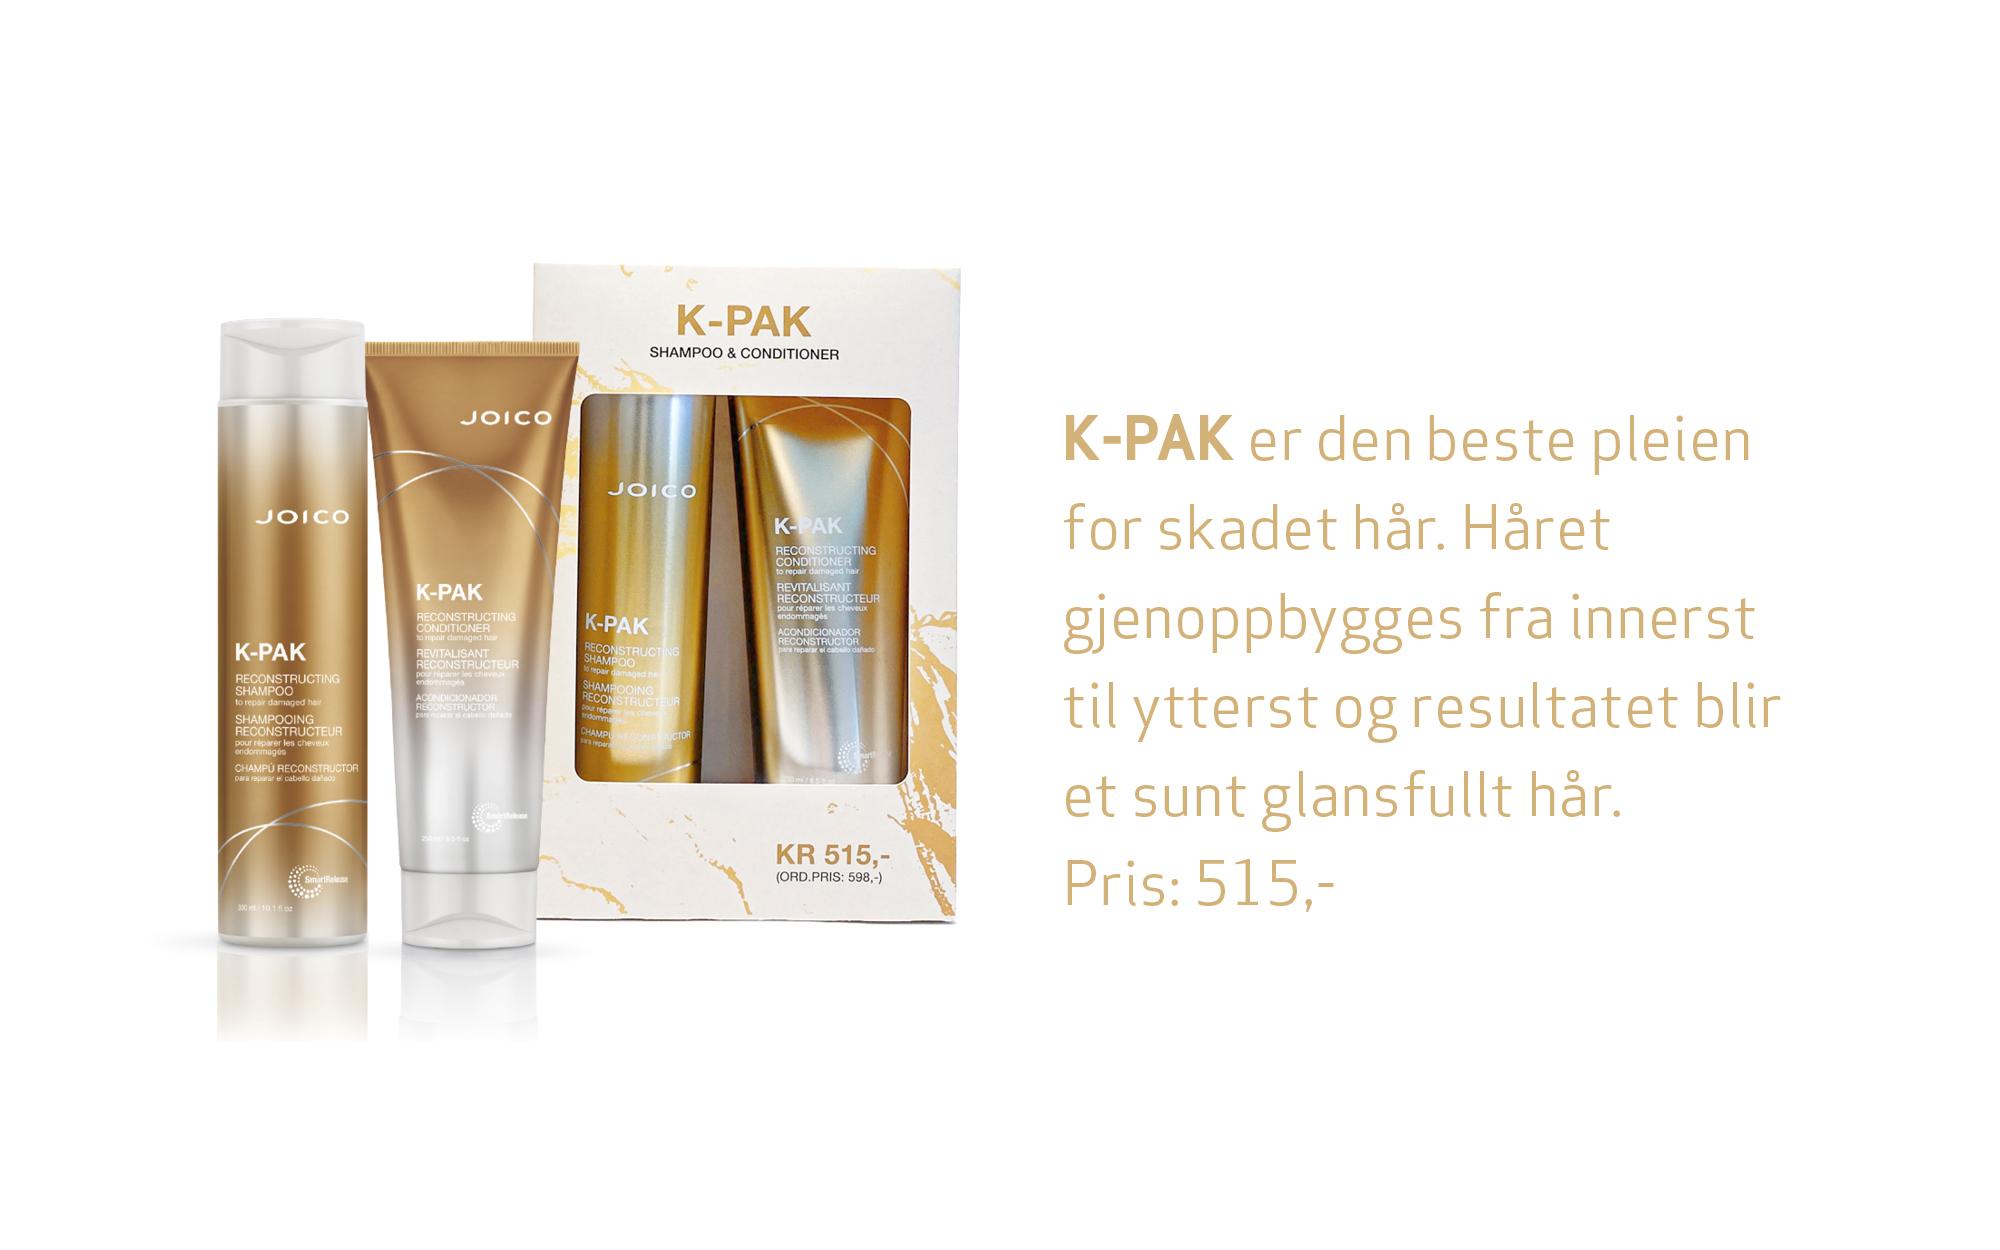 K-PAK Shampoo Conditioner